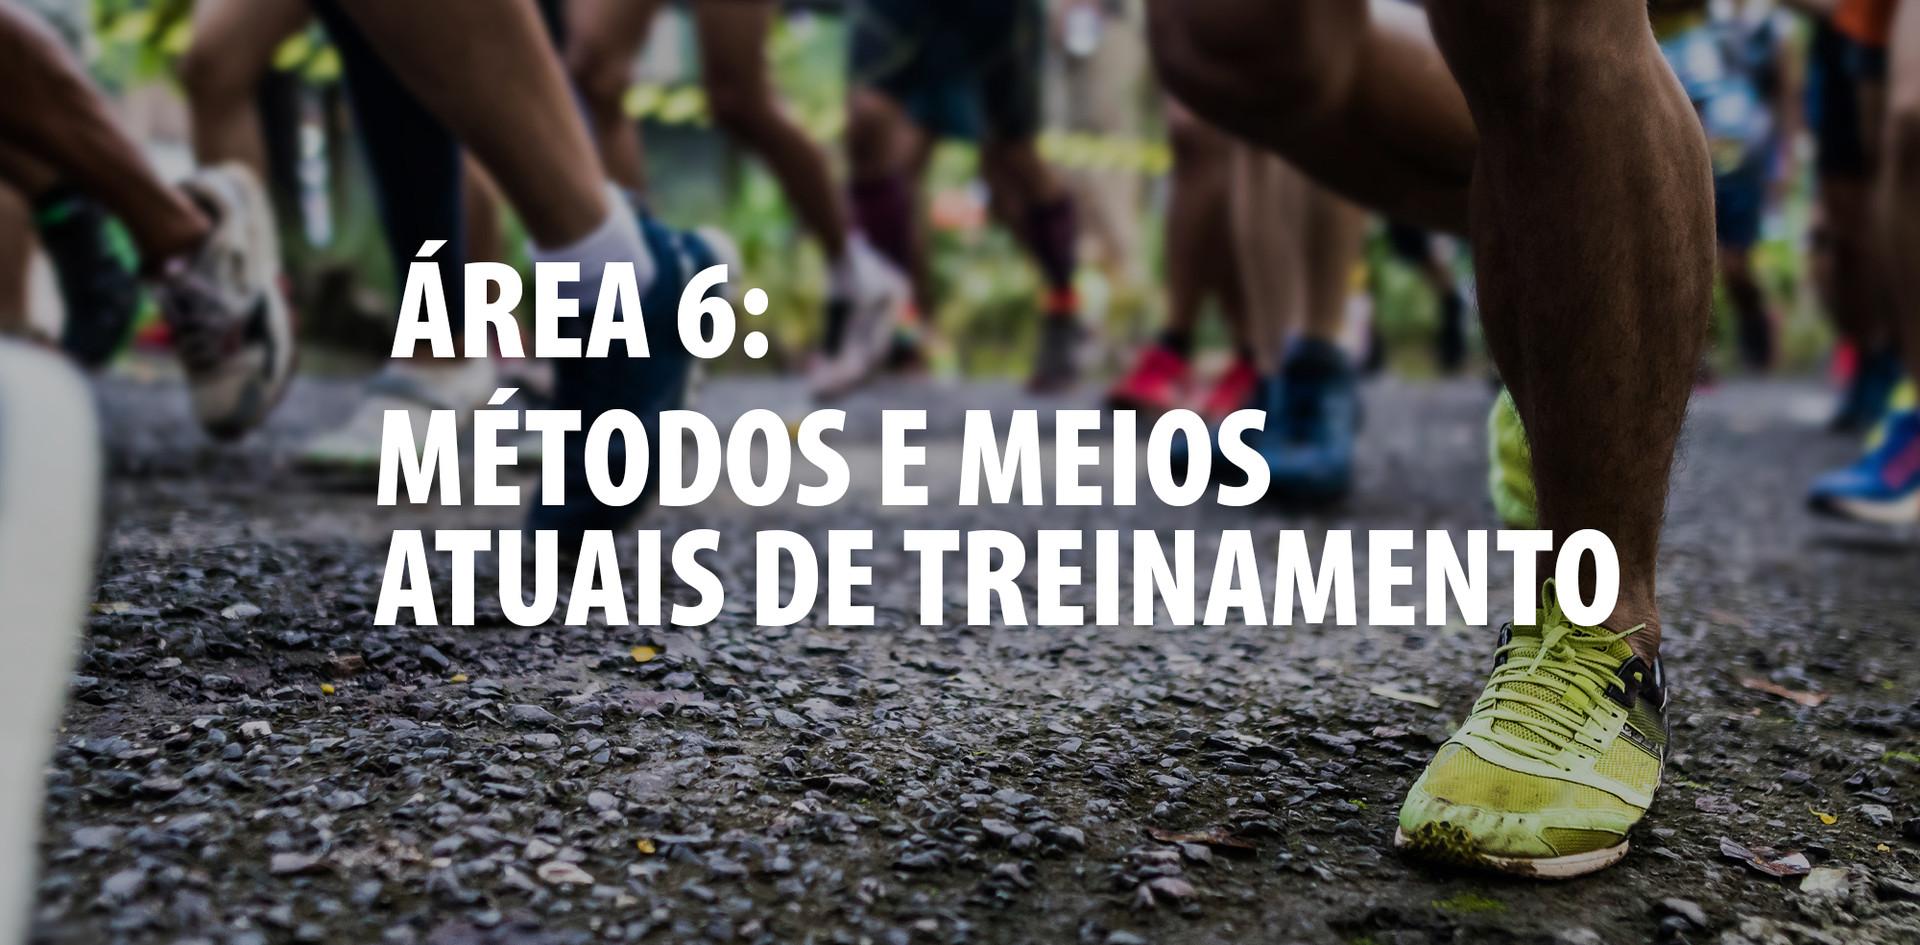 AREA 6.jpg